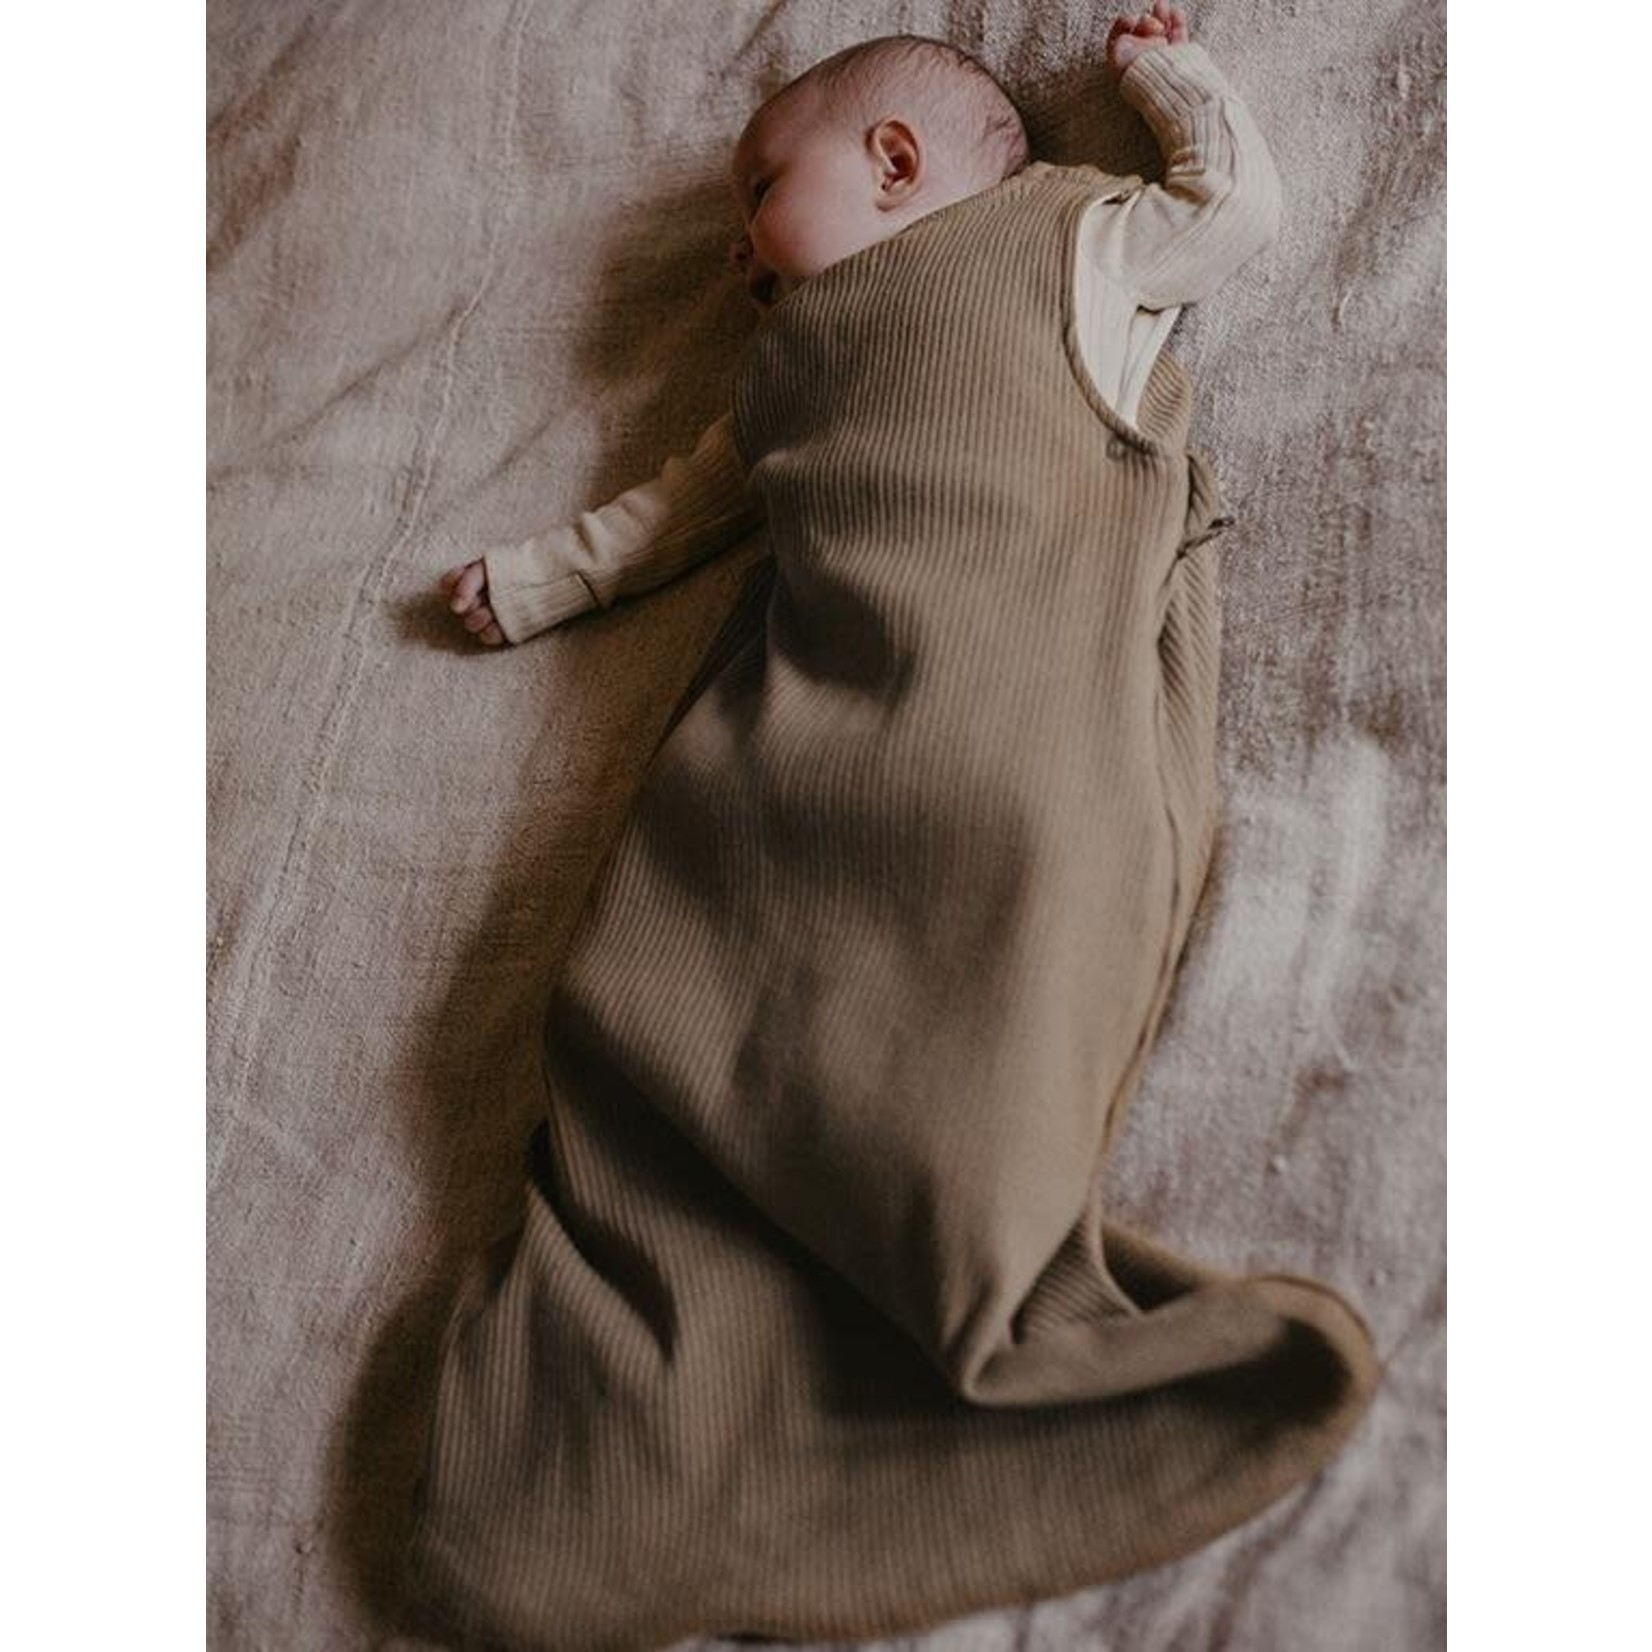 The Simple Folk The Ribbed Sleepsack